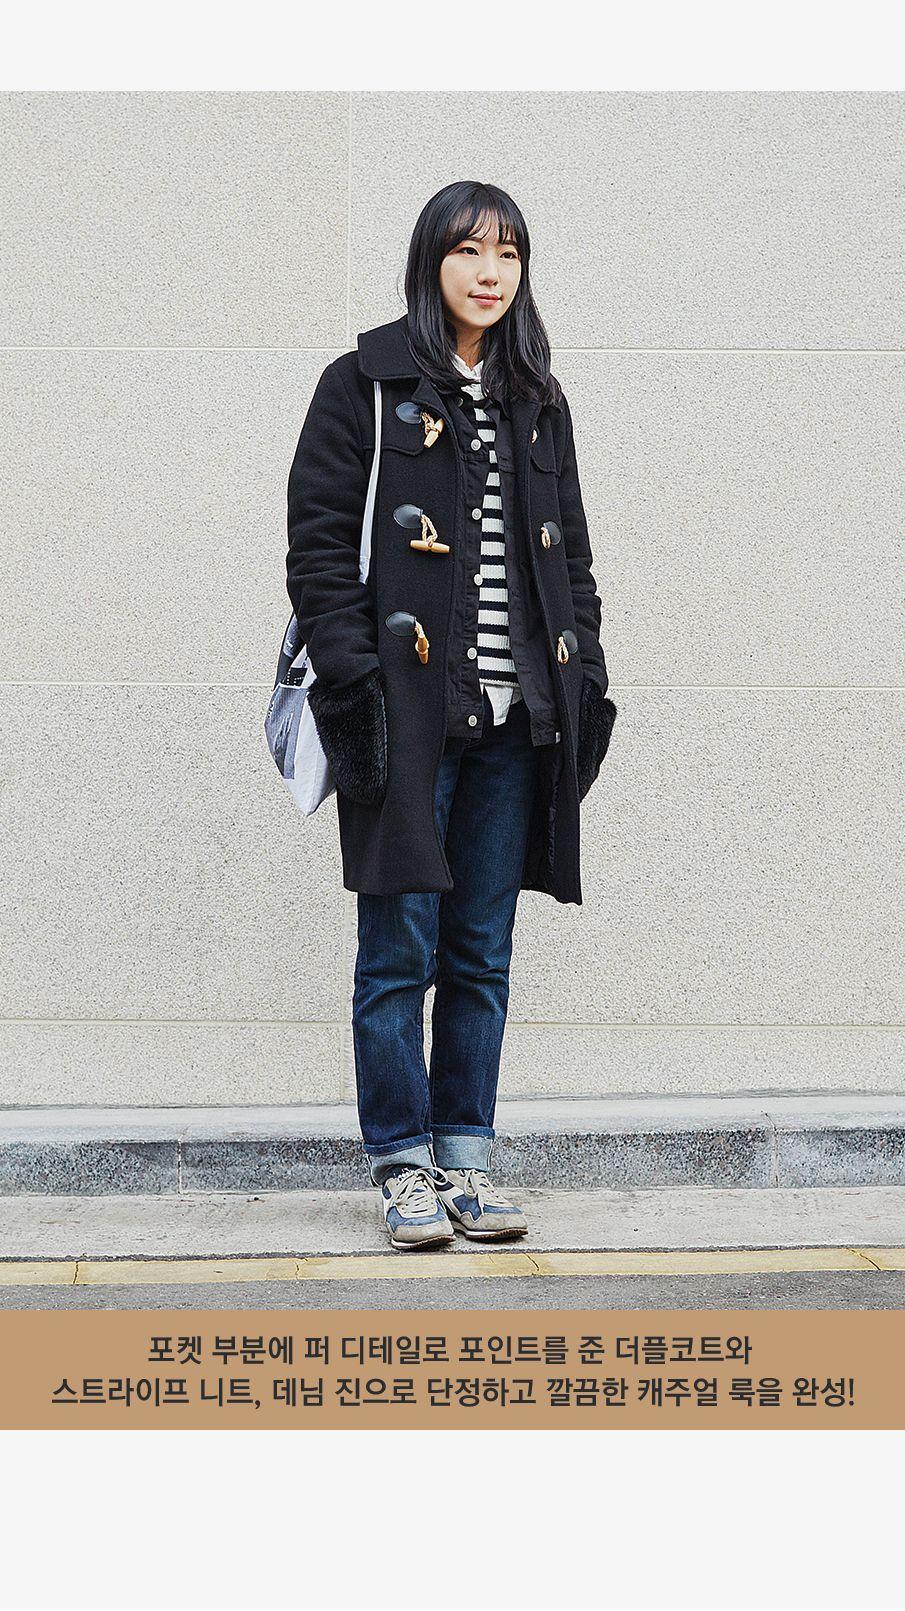 2017.02.09. THU > Magazine | 힙합퍼|거리의 시작 - Now, That's Street